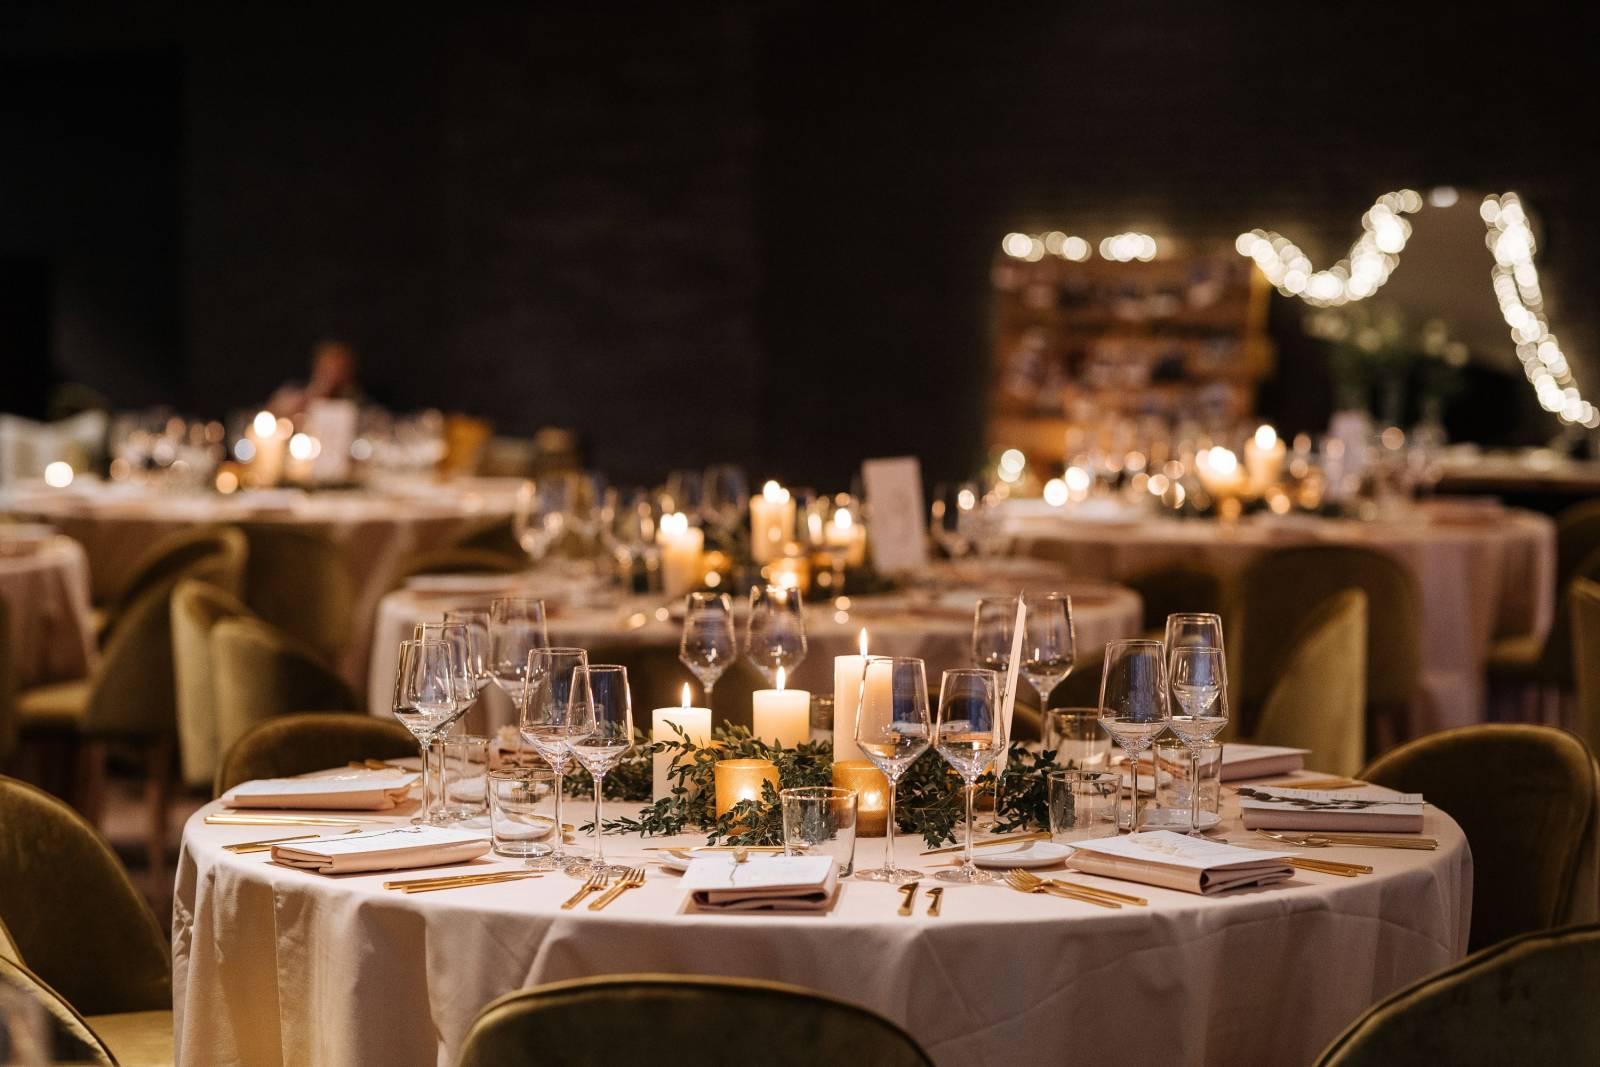 Hertog Jan - Feestzaal - Trouwzaal - House of Weddings - 8